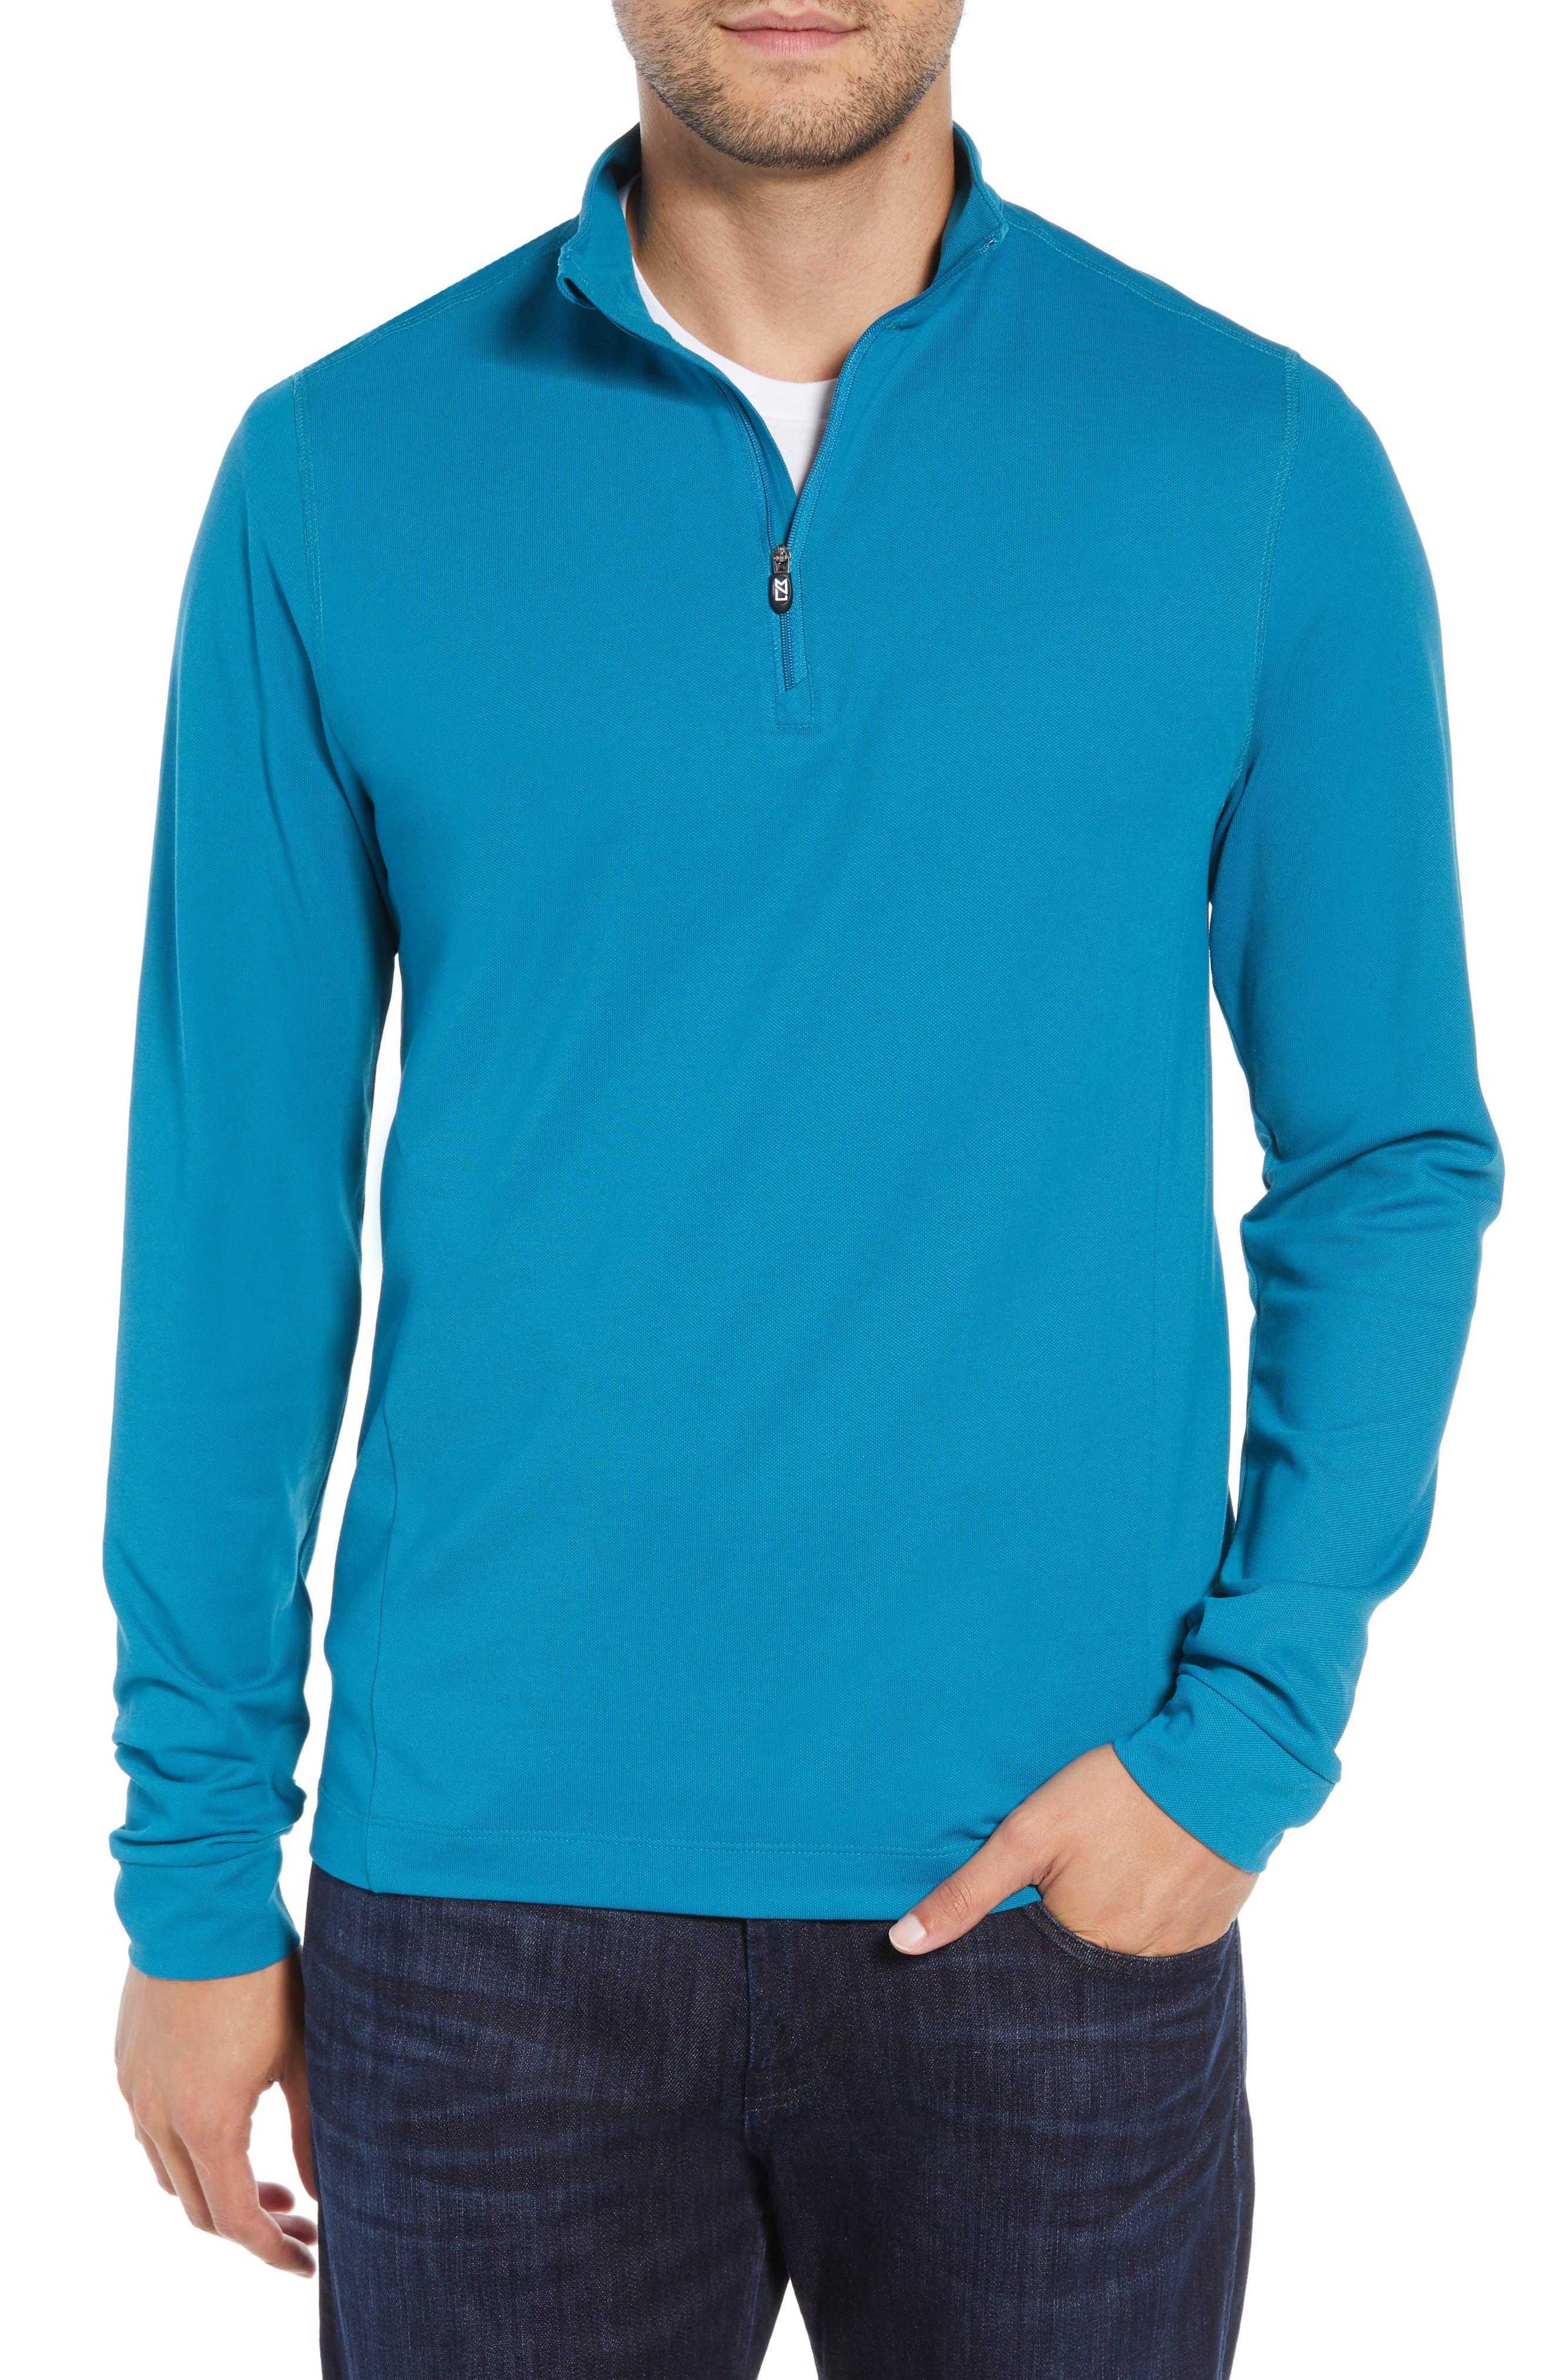 CUTTER & BUCK Advantage Regular Fit DryTec Mock Neck Pullover, Main, color, TEAL BLUE